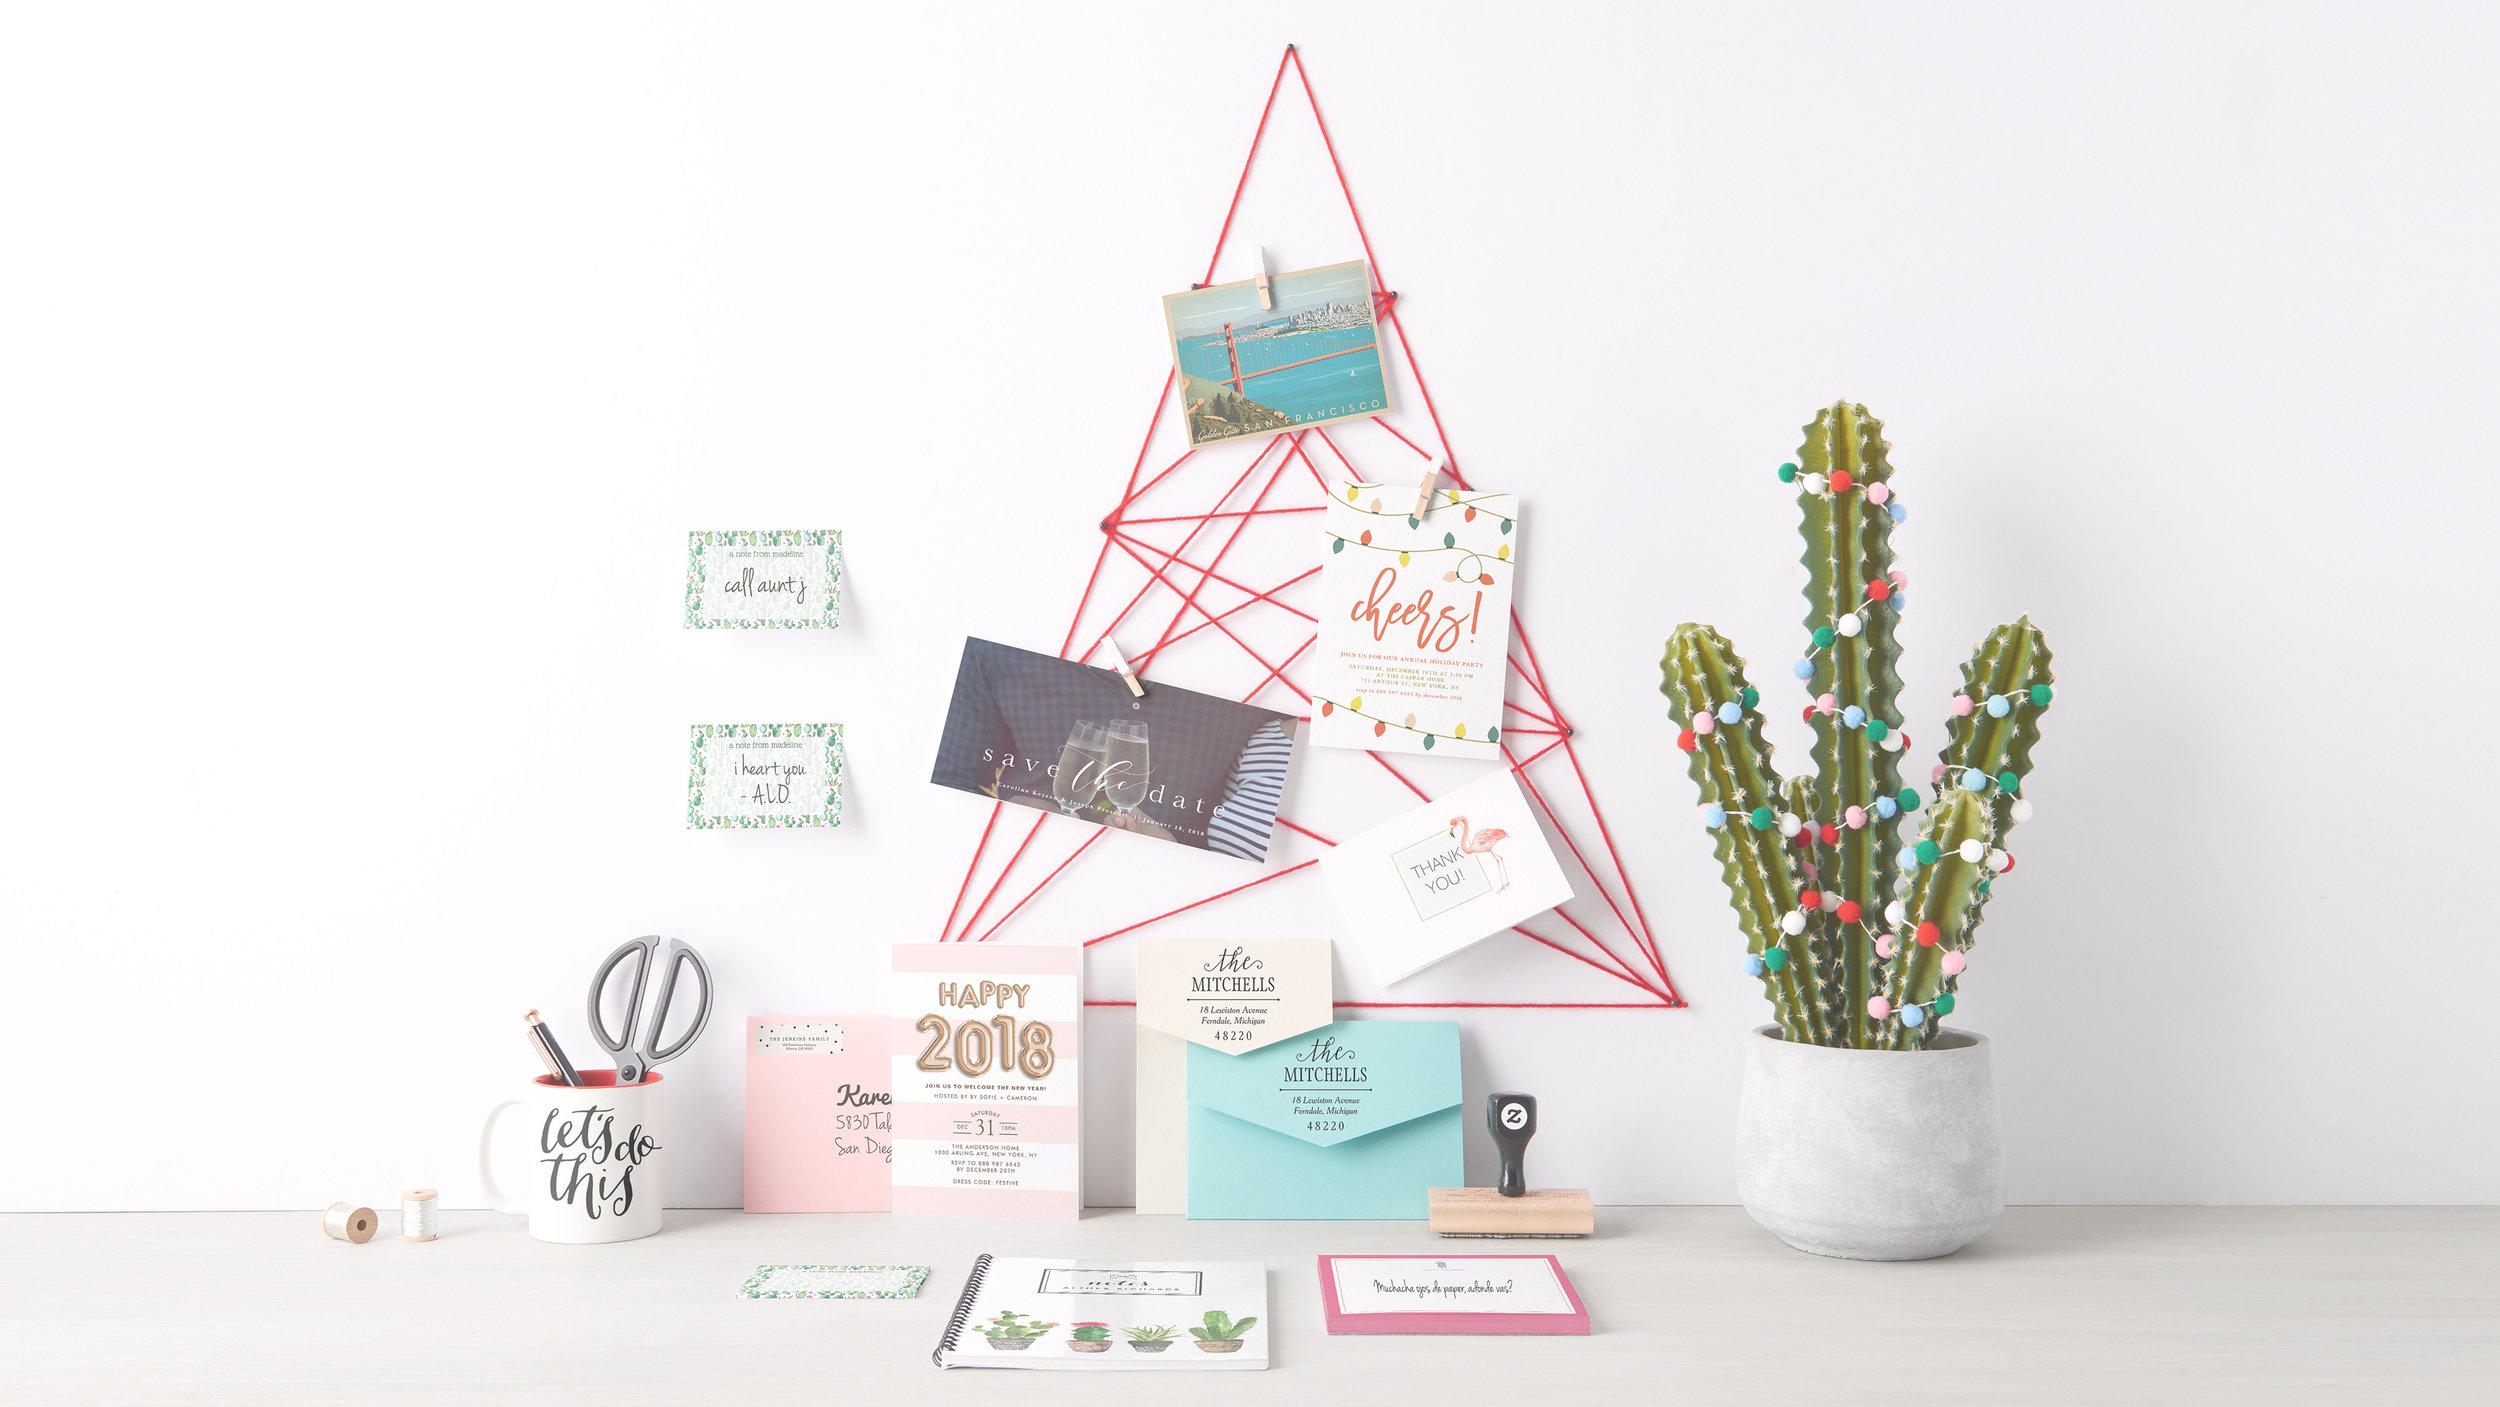 Paper_String_Tree_Holidays_2017_Screen_Saver_2018.jpg